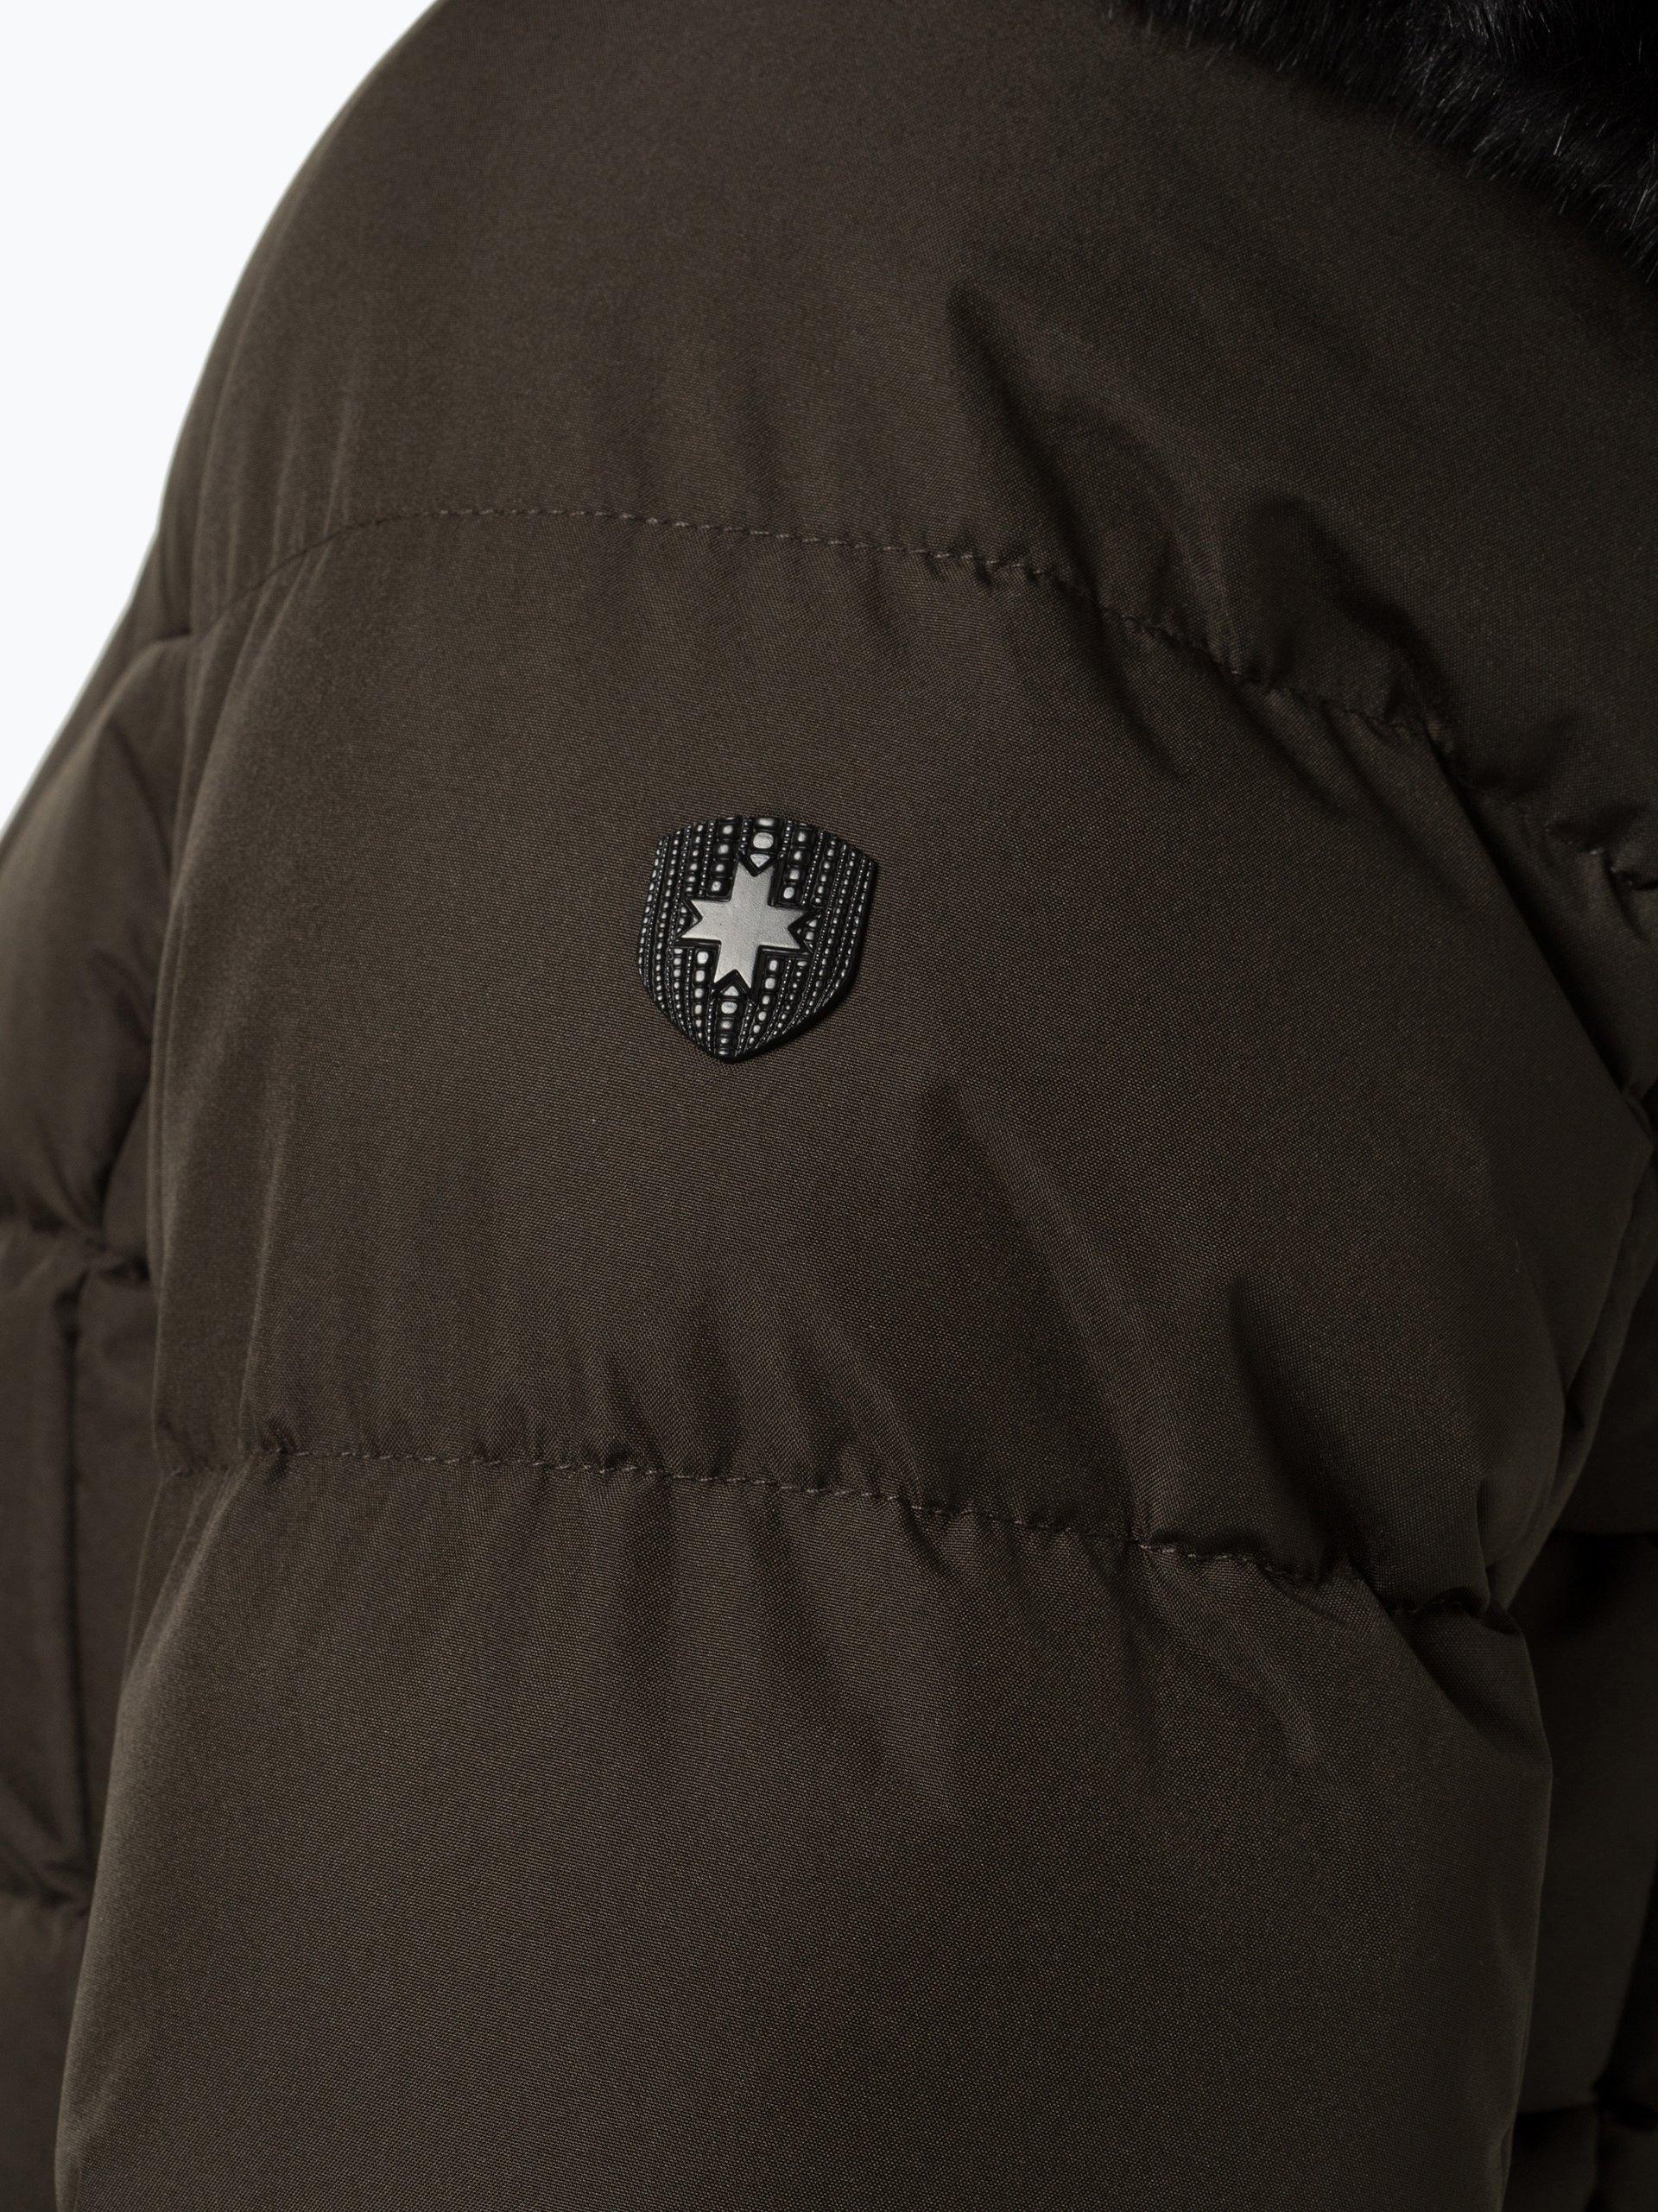 Wellensteyn Damska kurtka funkcyjna – Belvedere